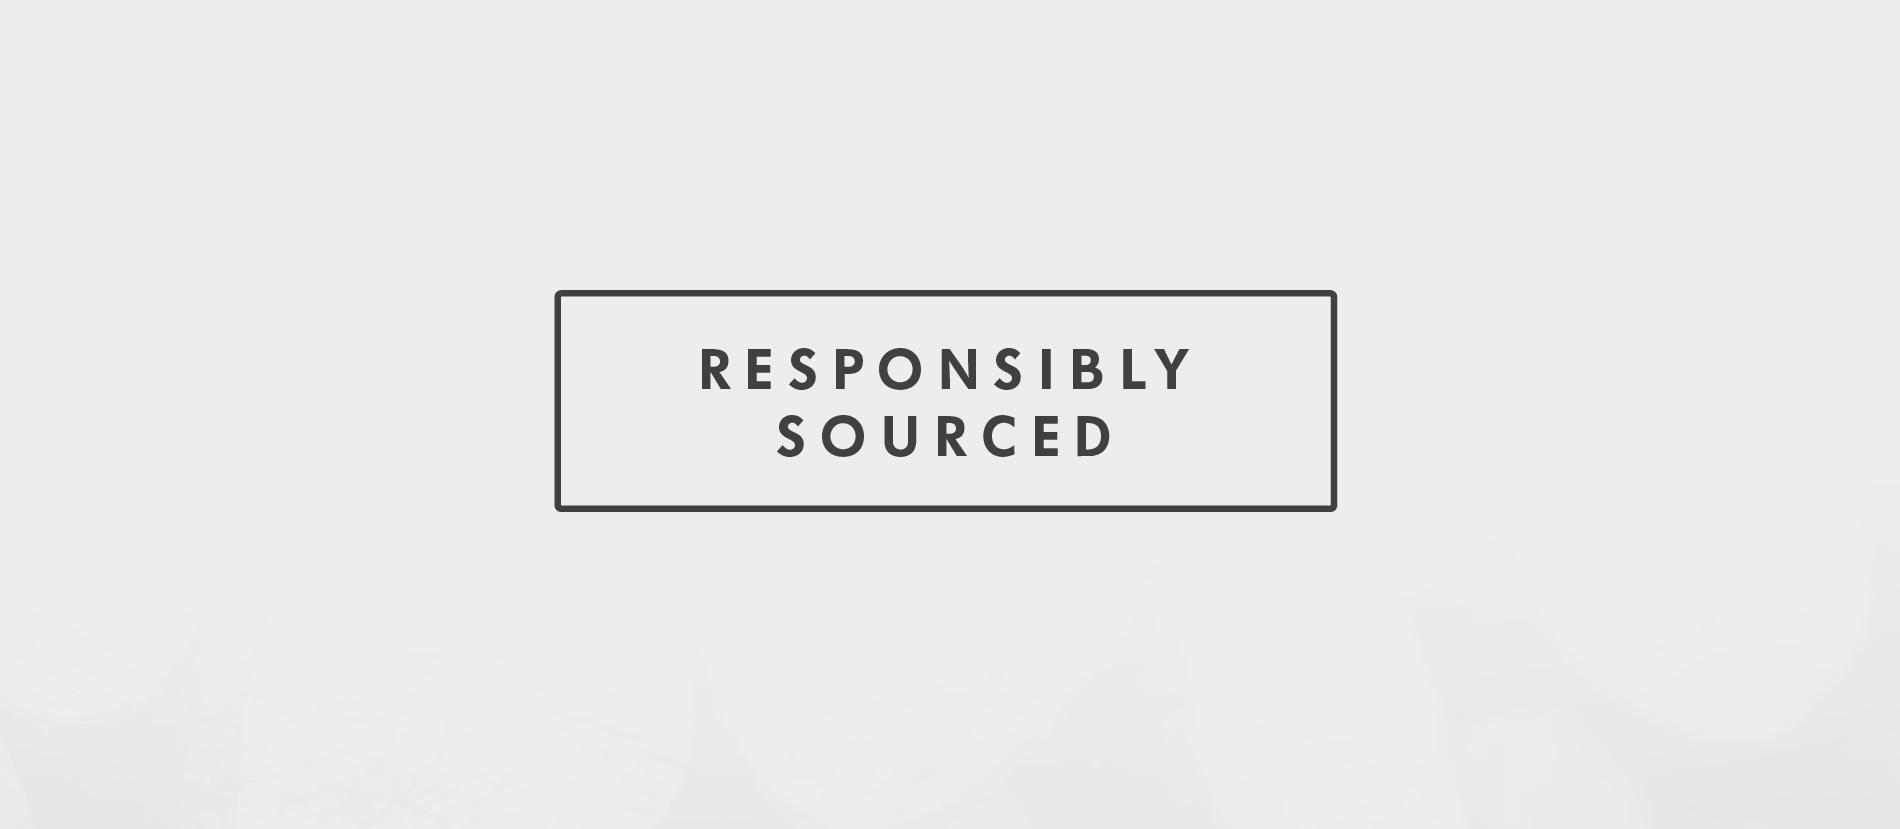 ResponsiblySourced